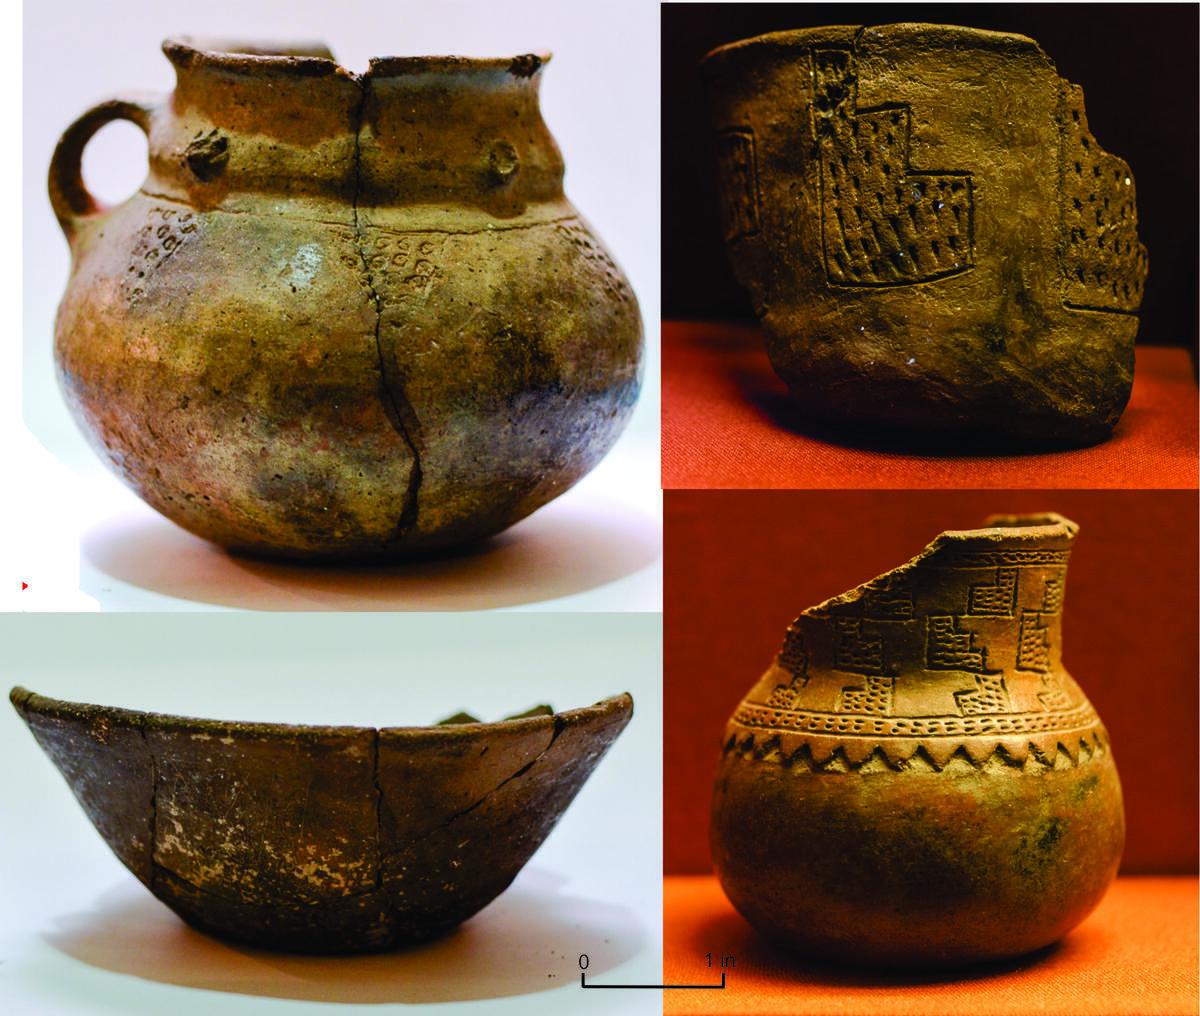 four ceramic vessels featuring embossed designs